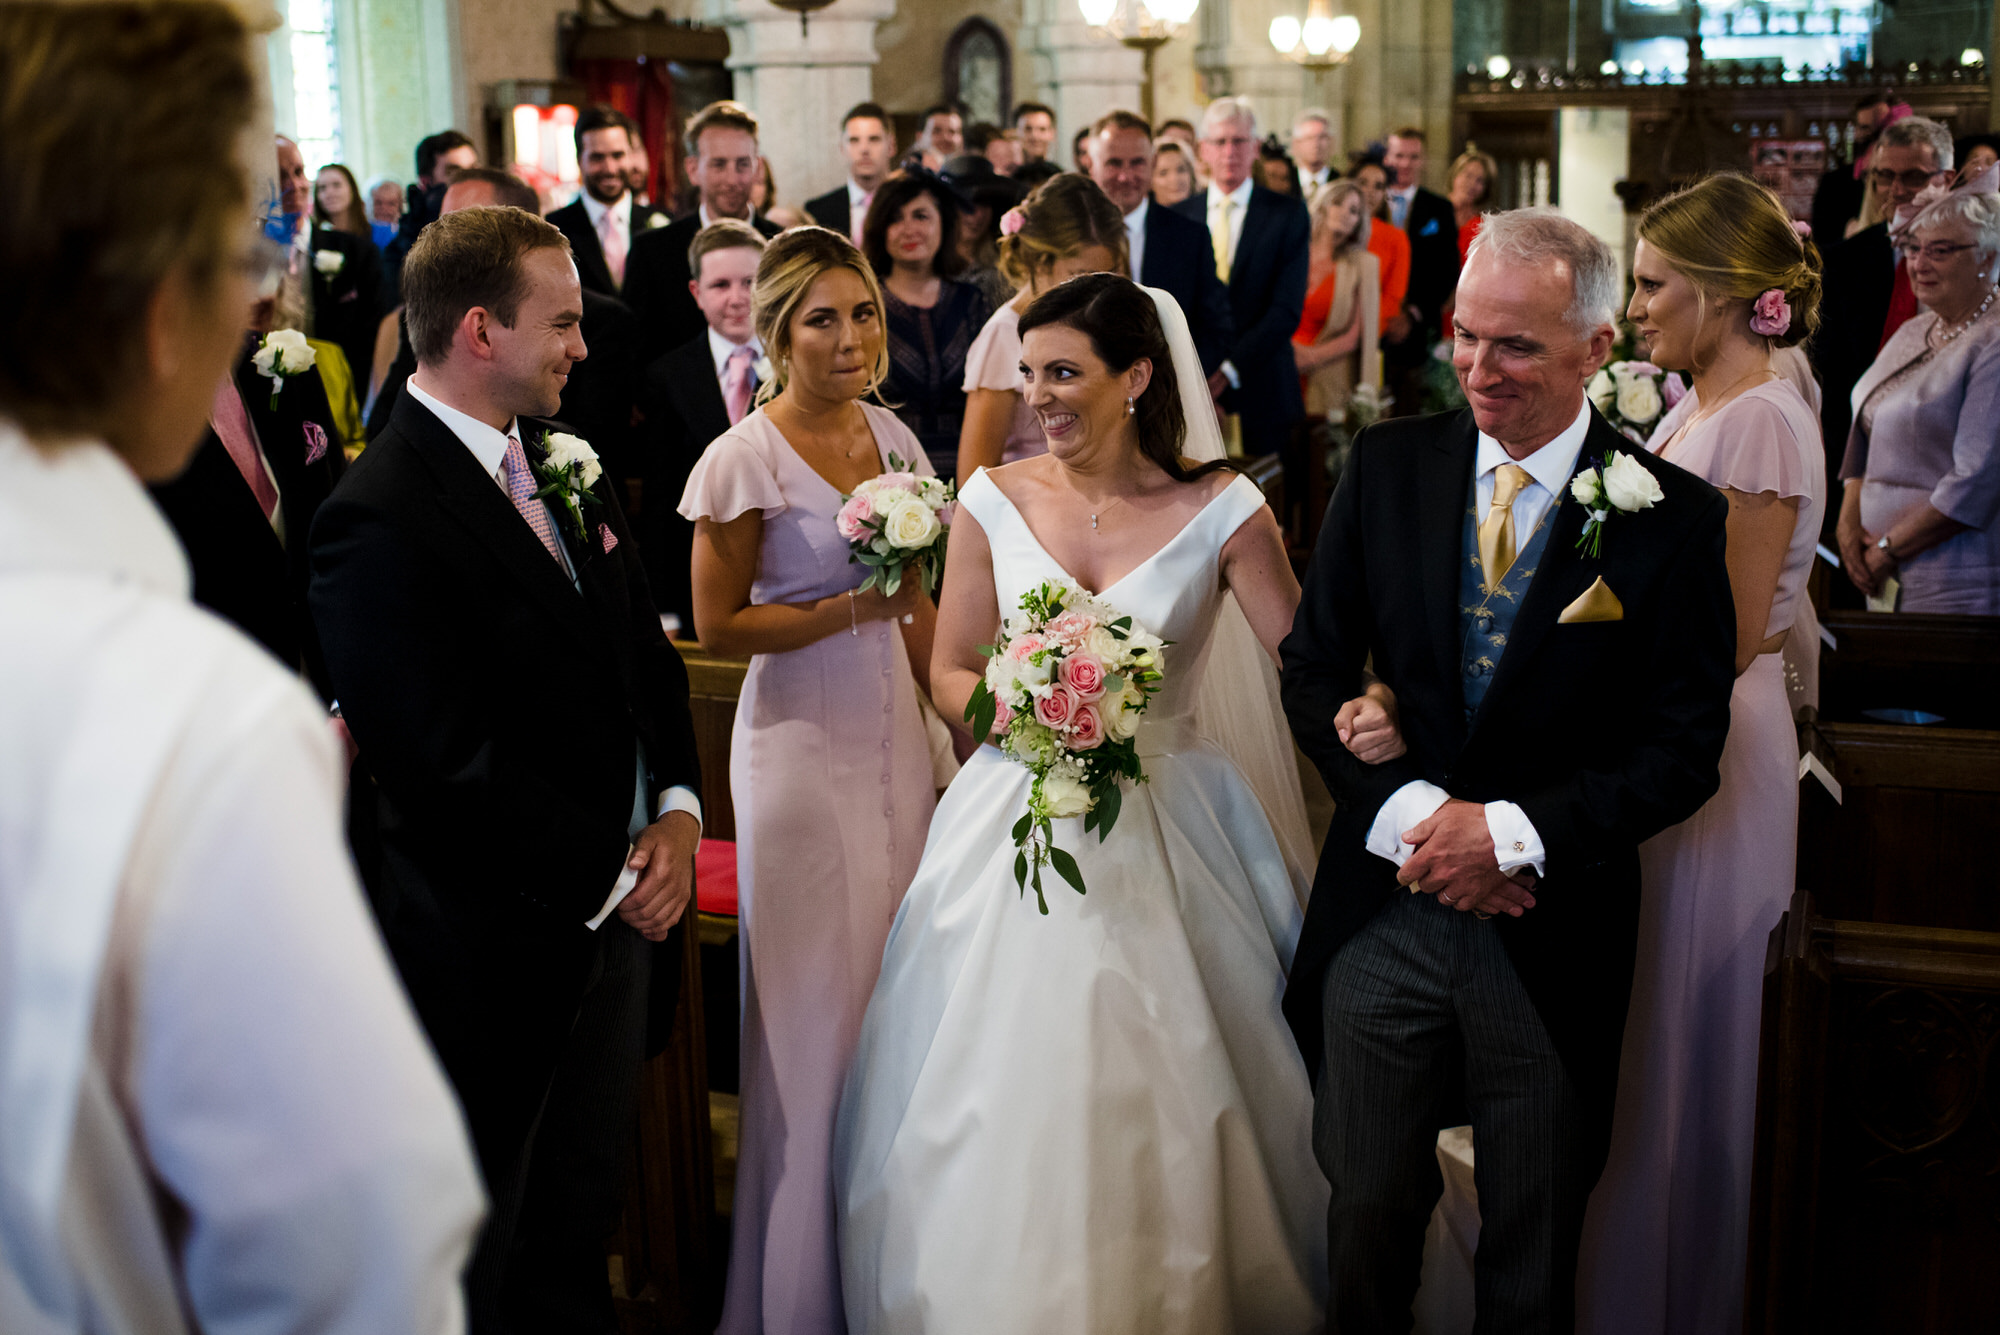 Shilstone wedding photographer 11